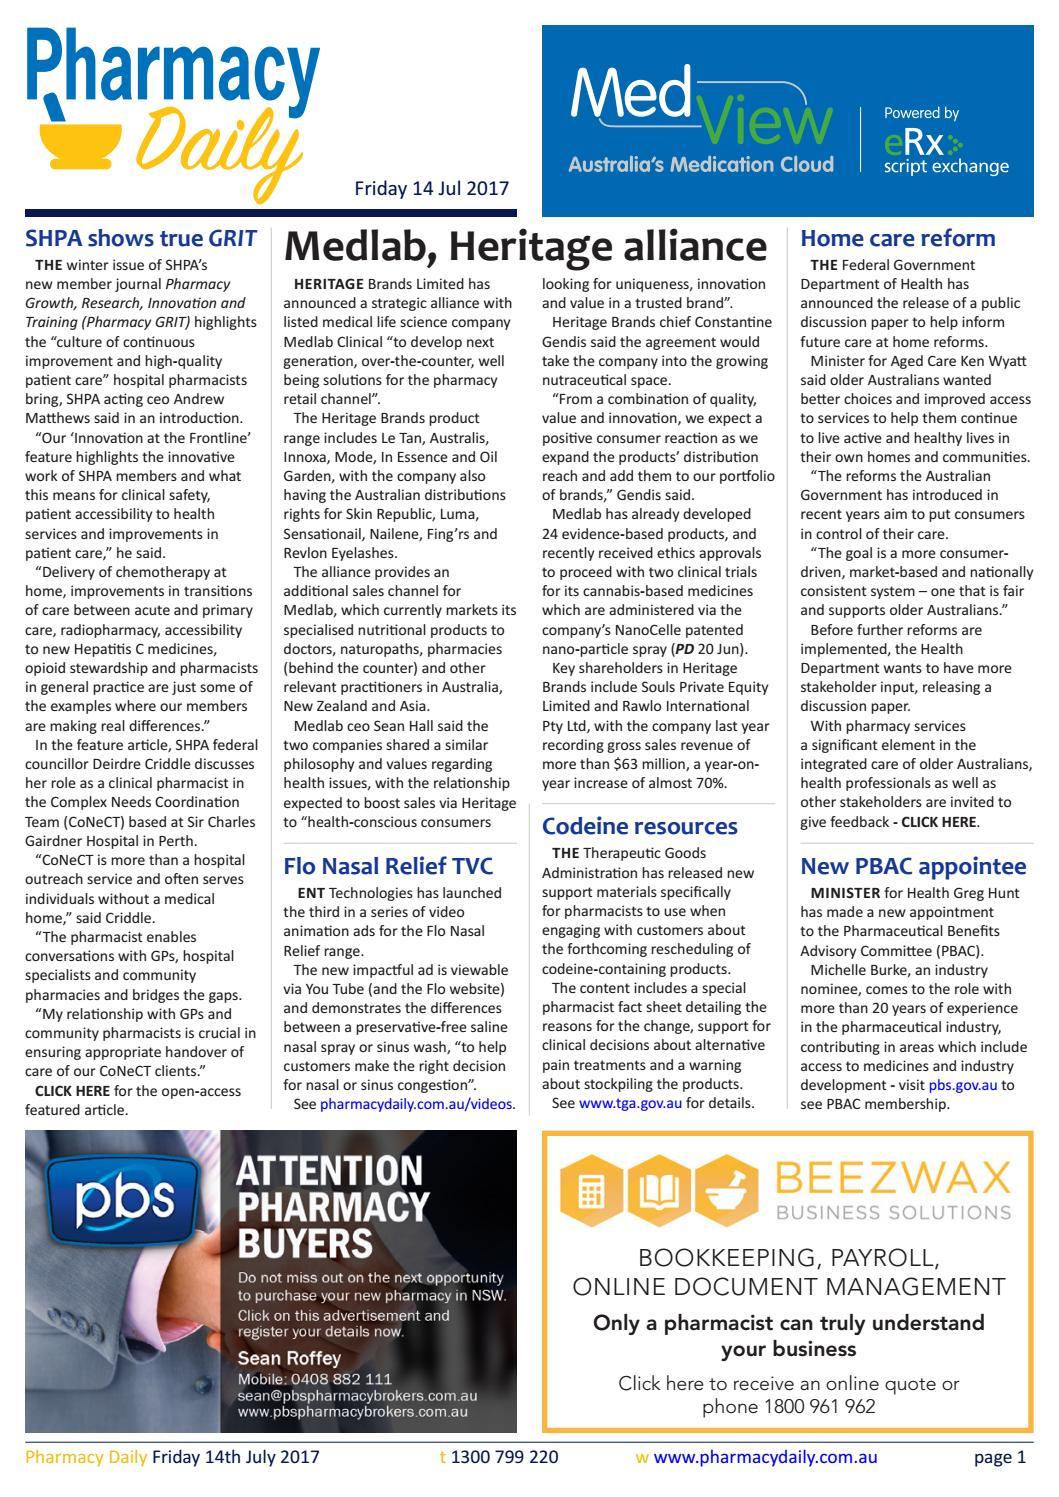 PD for Fri 14 Jul 2017 - Medlab, Heritage alliance, DAA